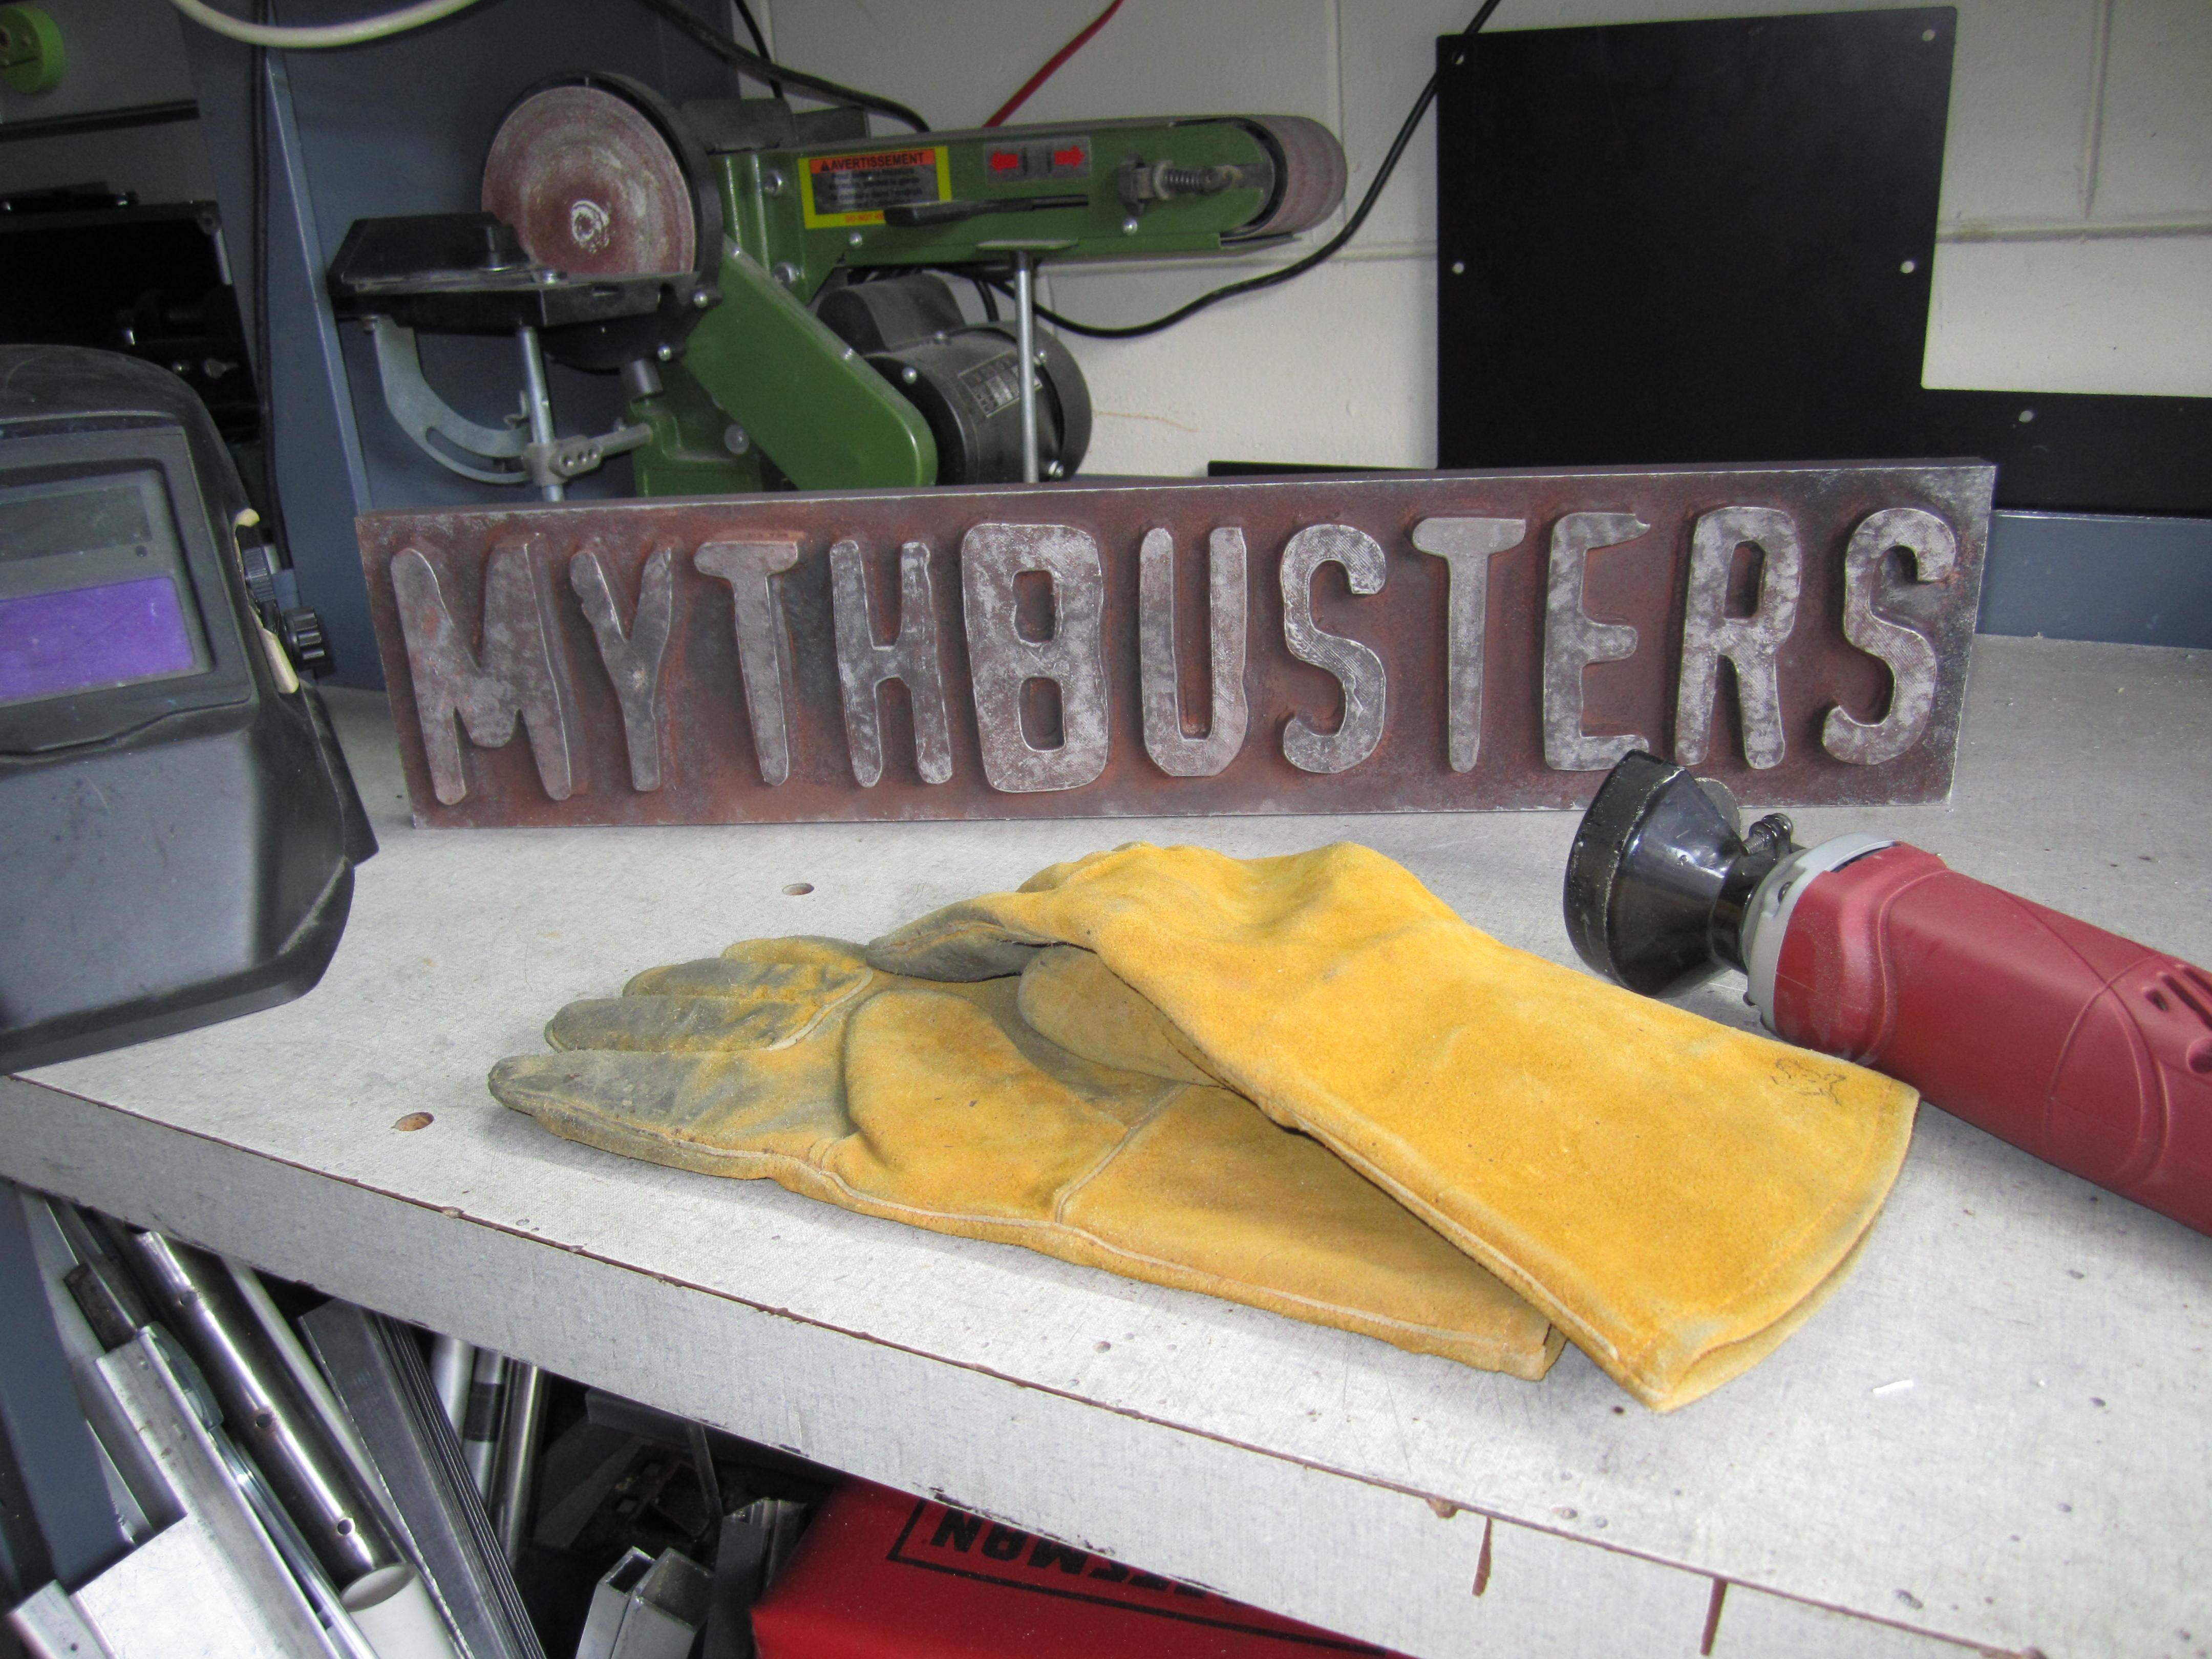 Mythbusters Sign 3.JPG